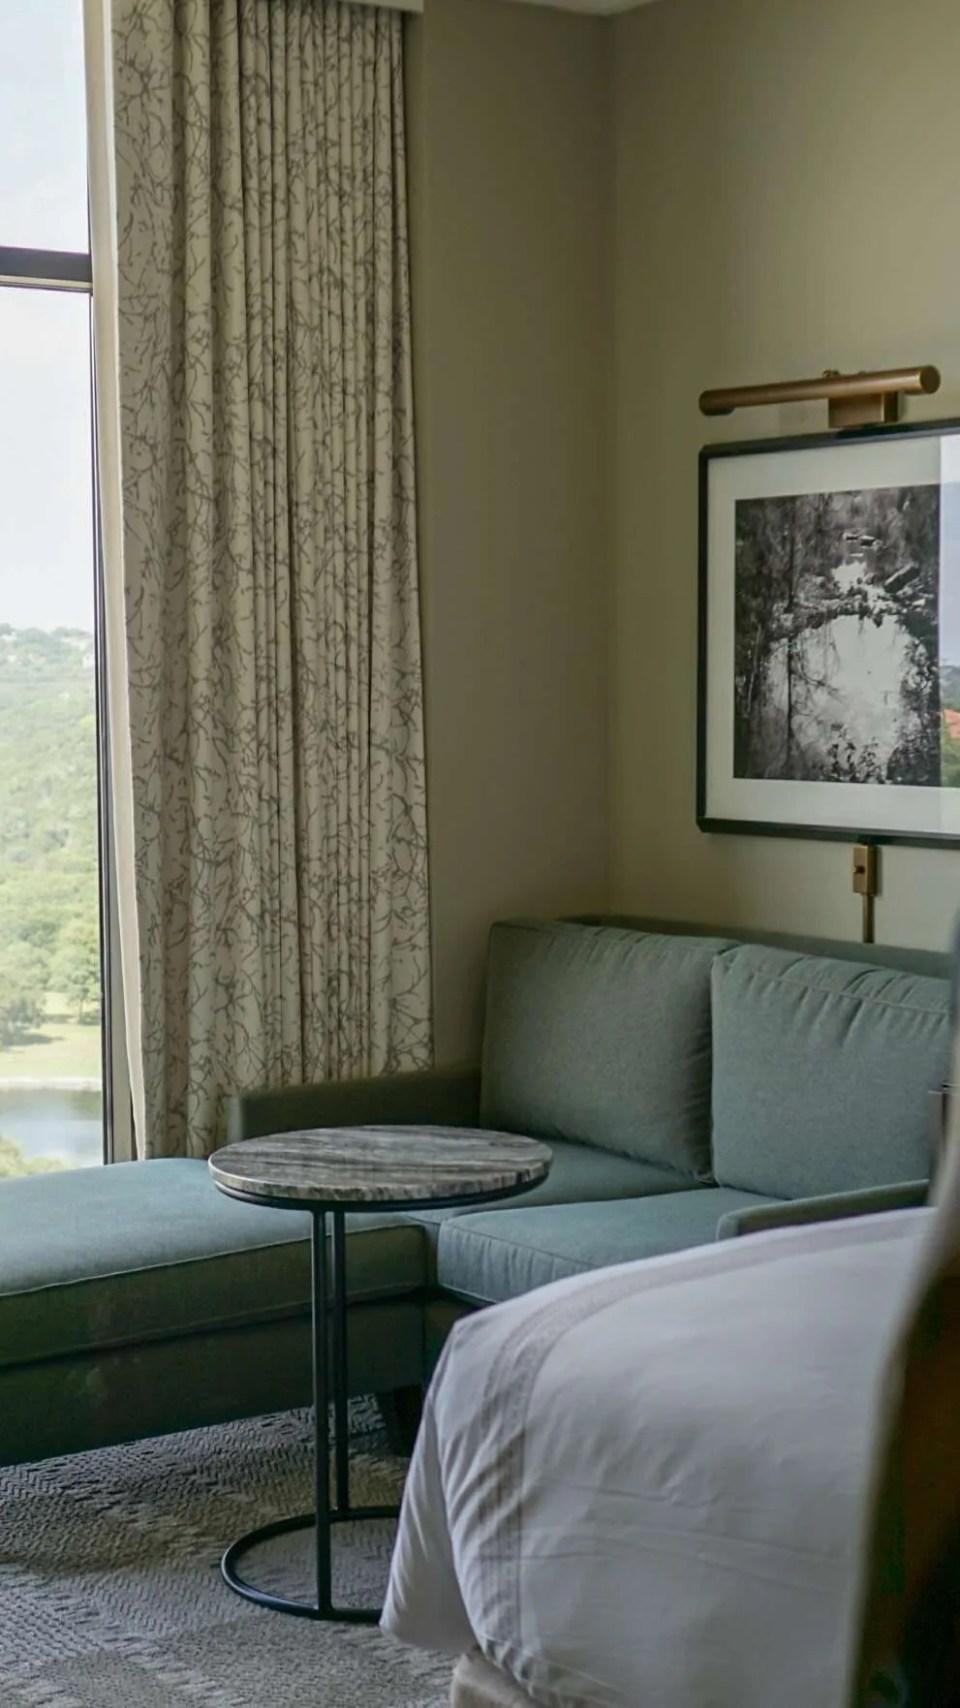 Sitting area at the Omni Barton Creek Resort & Spa in Austin